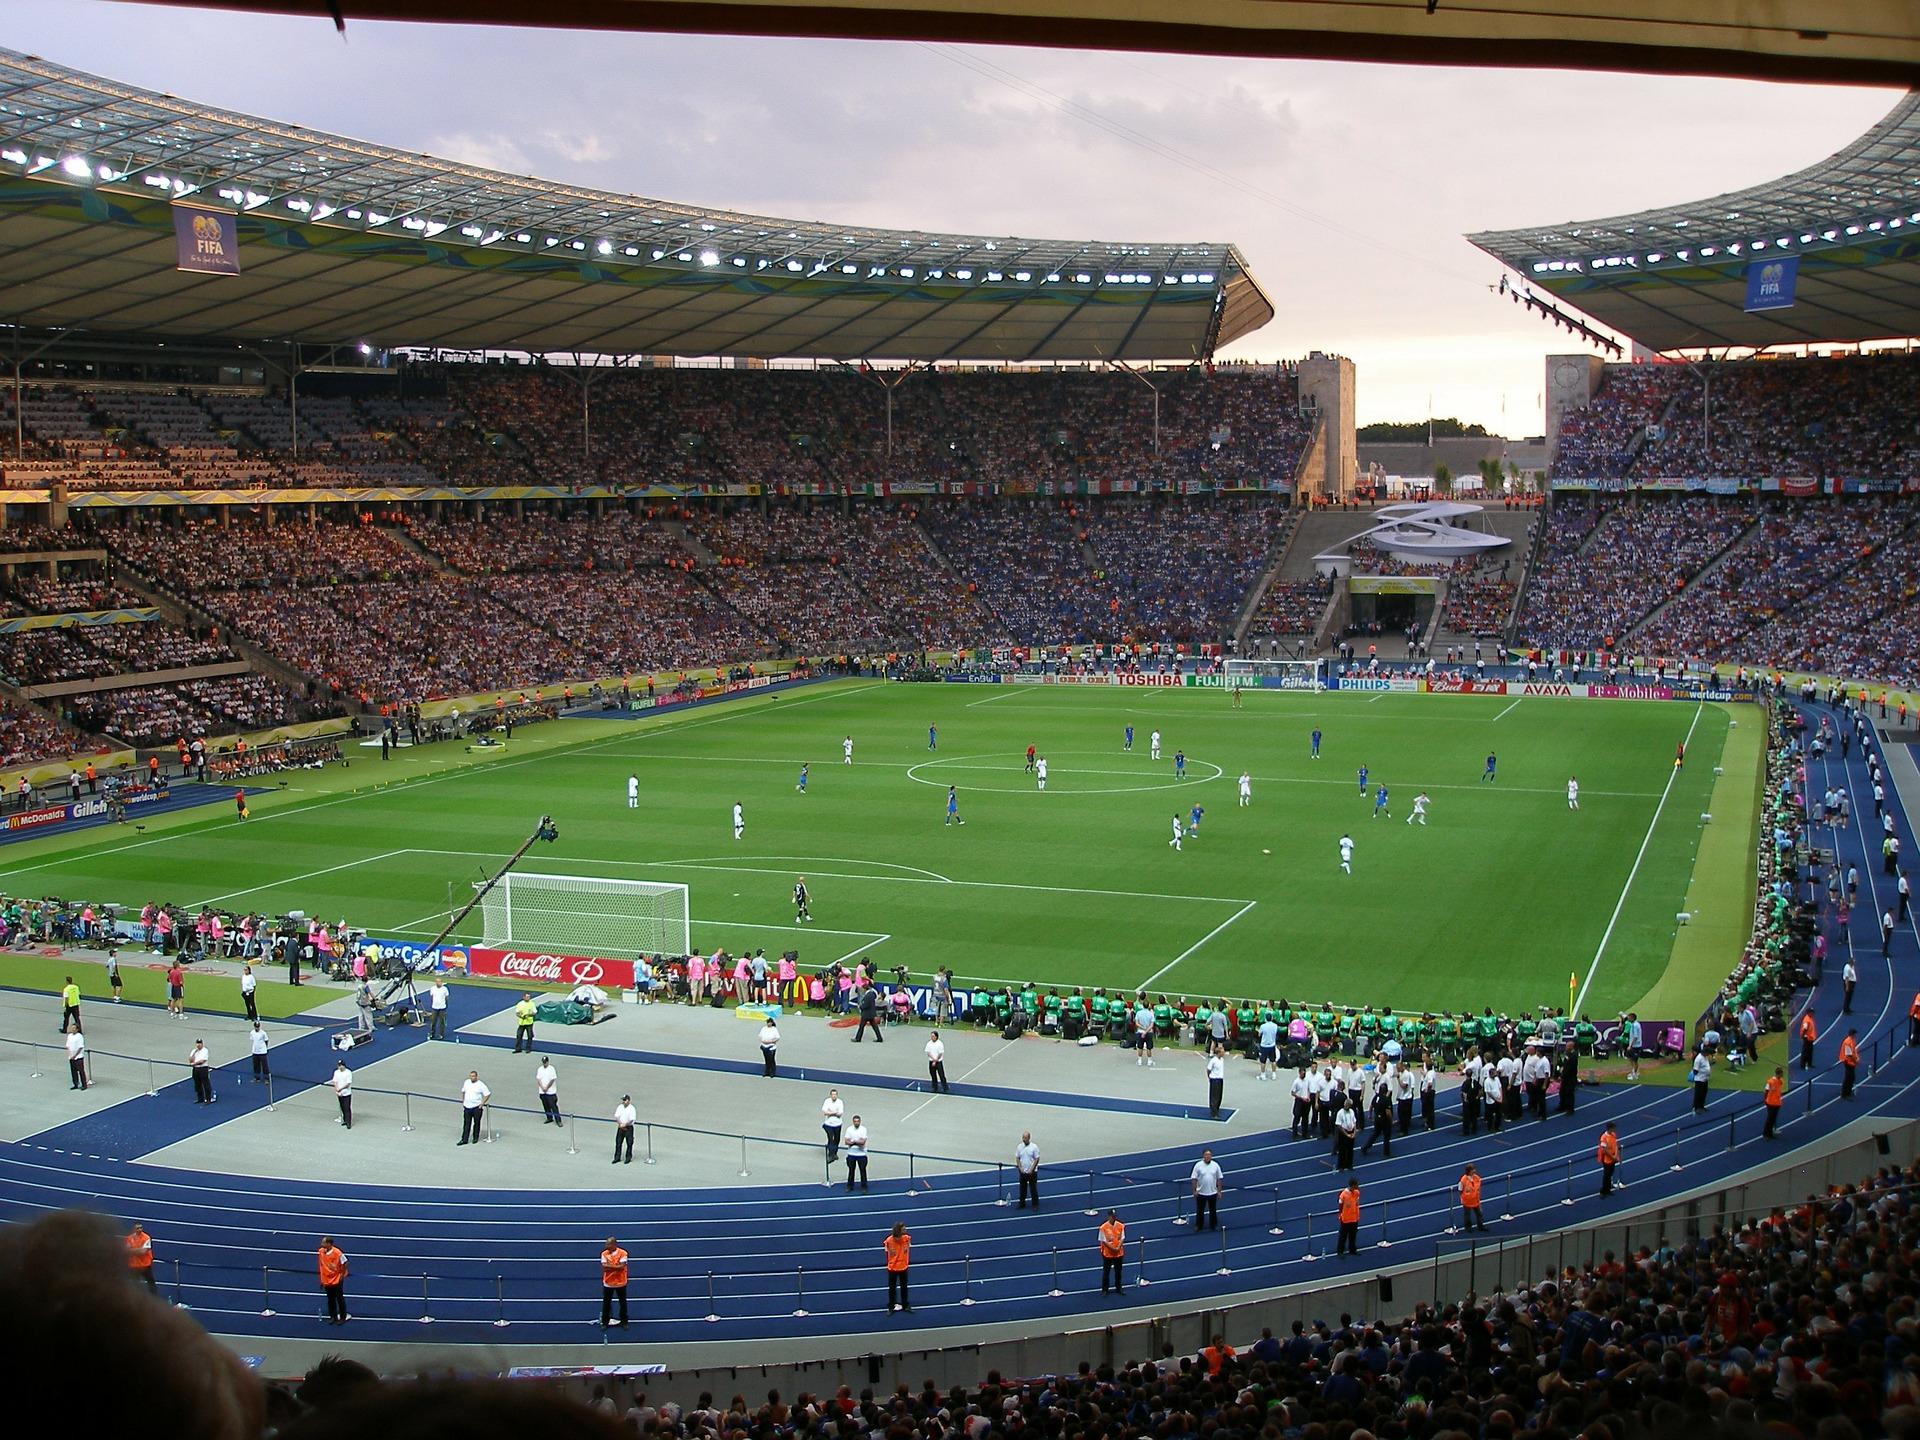 Hertha BSC vs Schalke 04 Bundesliga im Olympia Stadion in Berlin